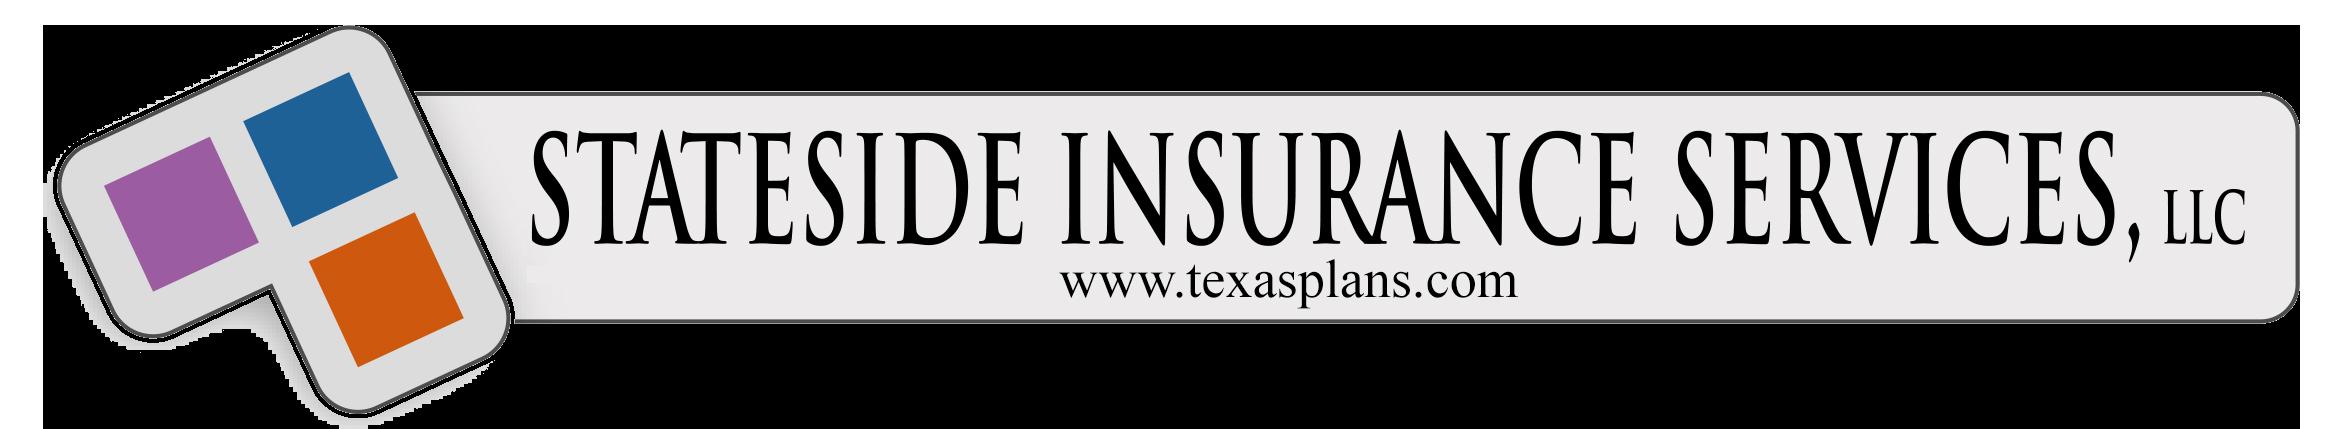 TexasPlans